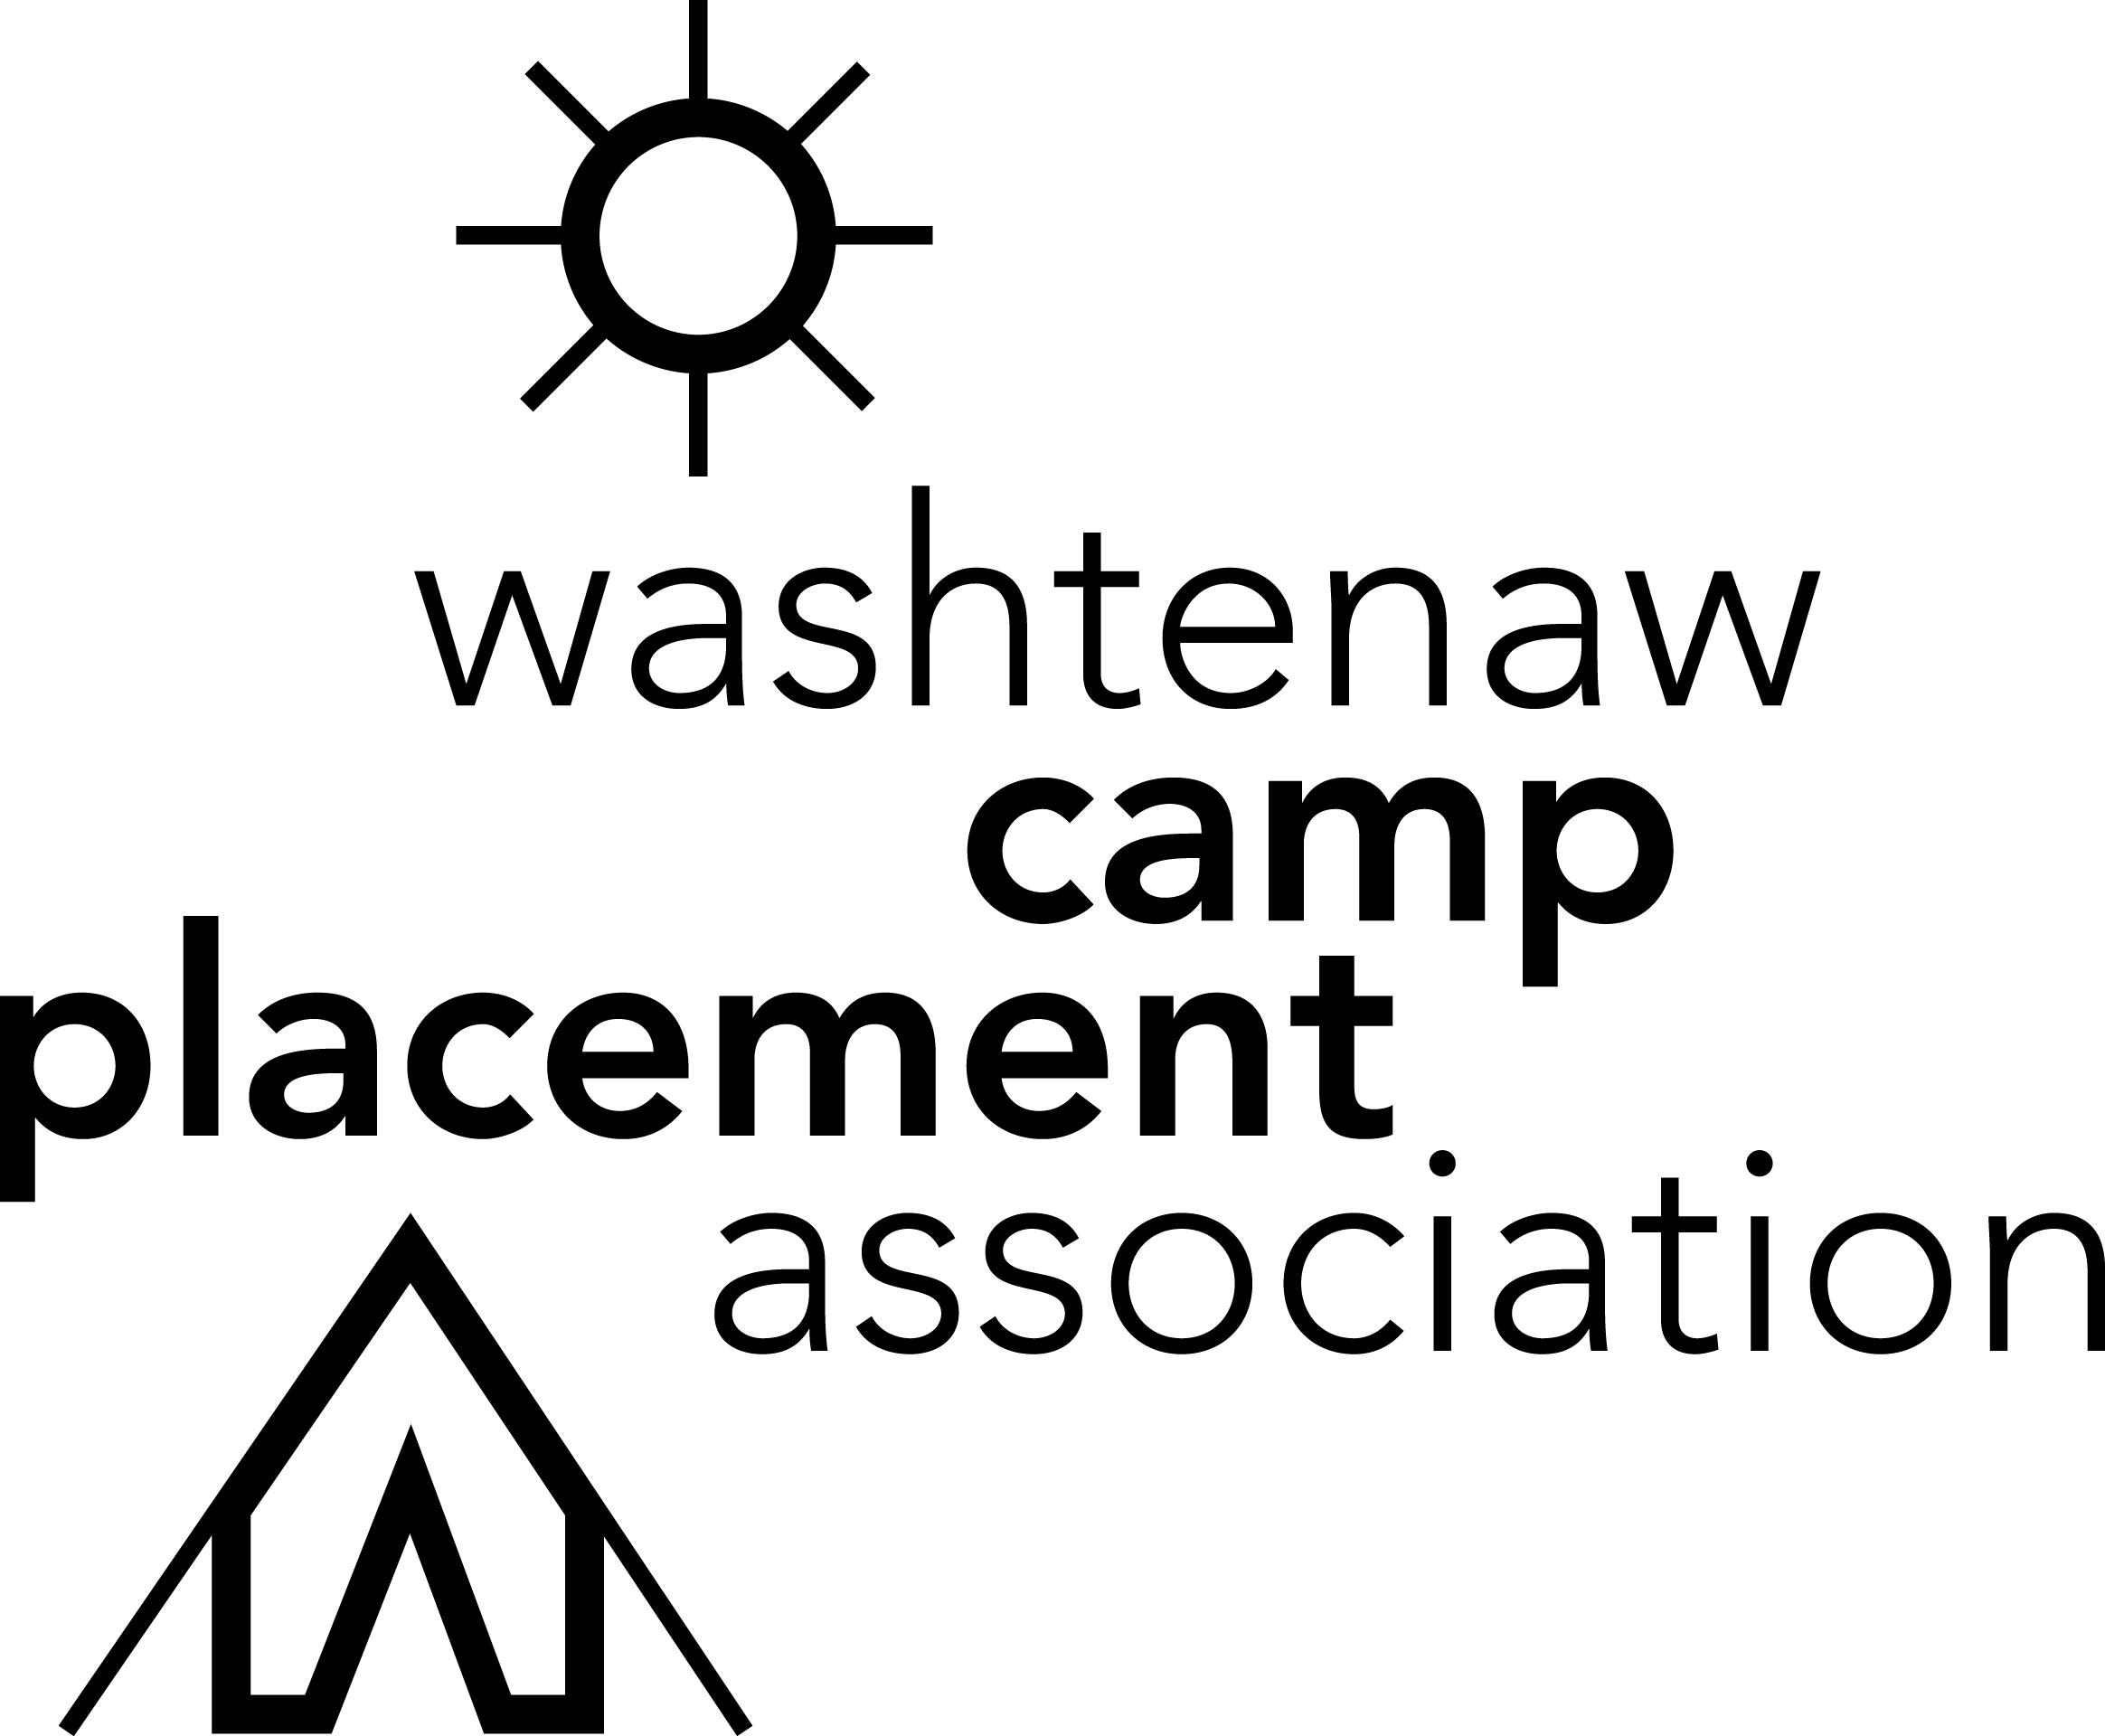 Wash Camp Placement Logo.jpg